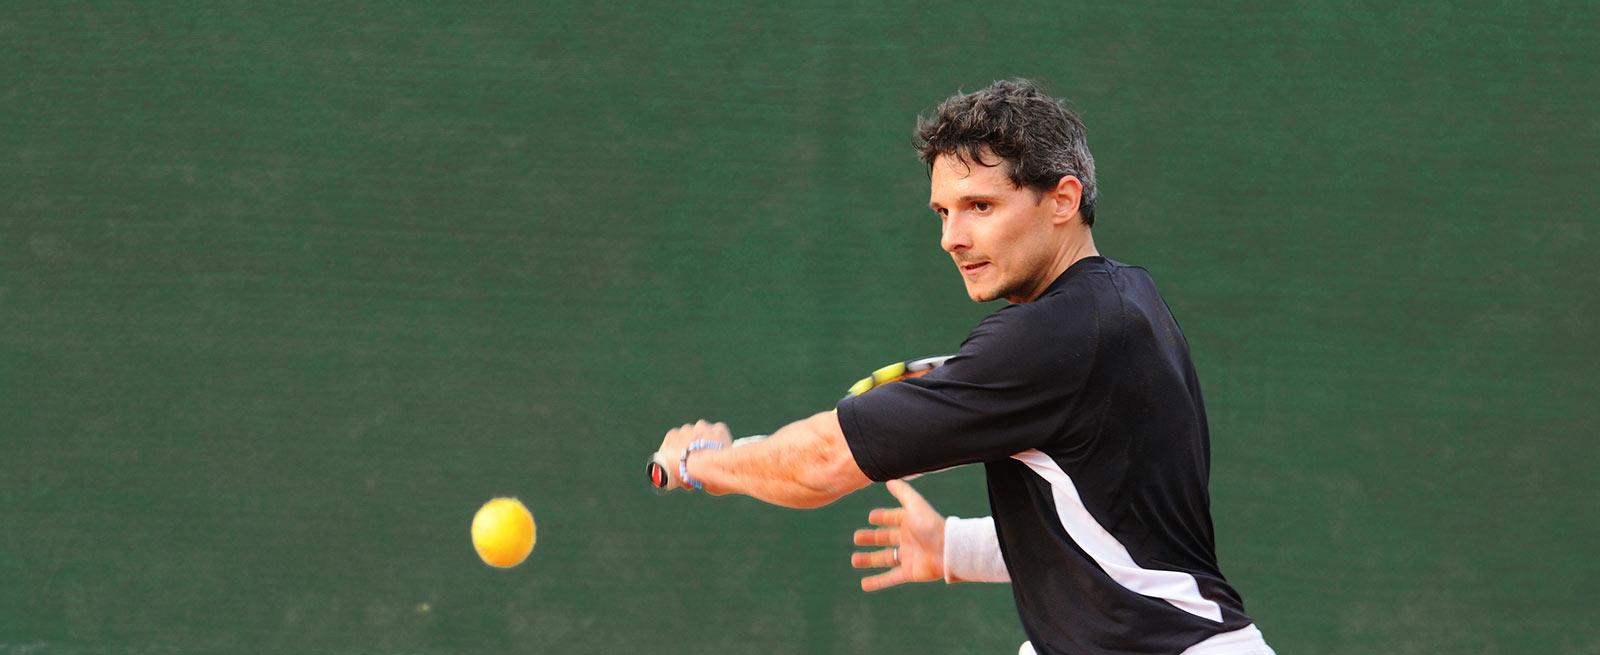 tennis lessons Toronto